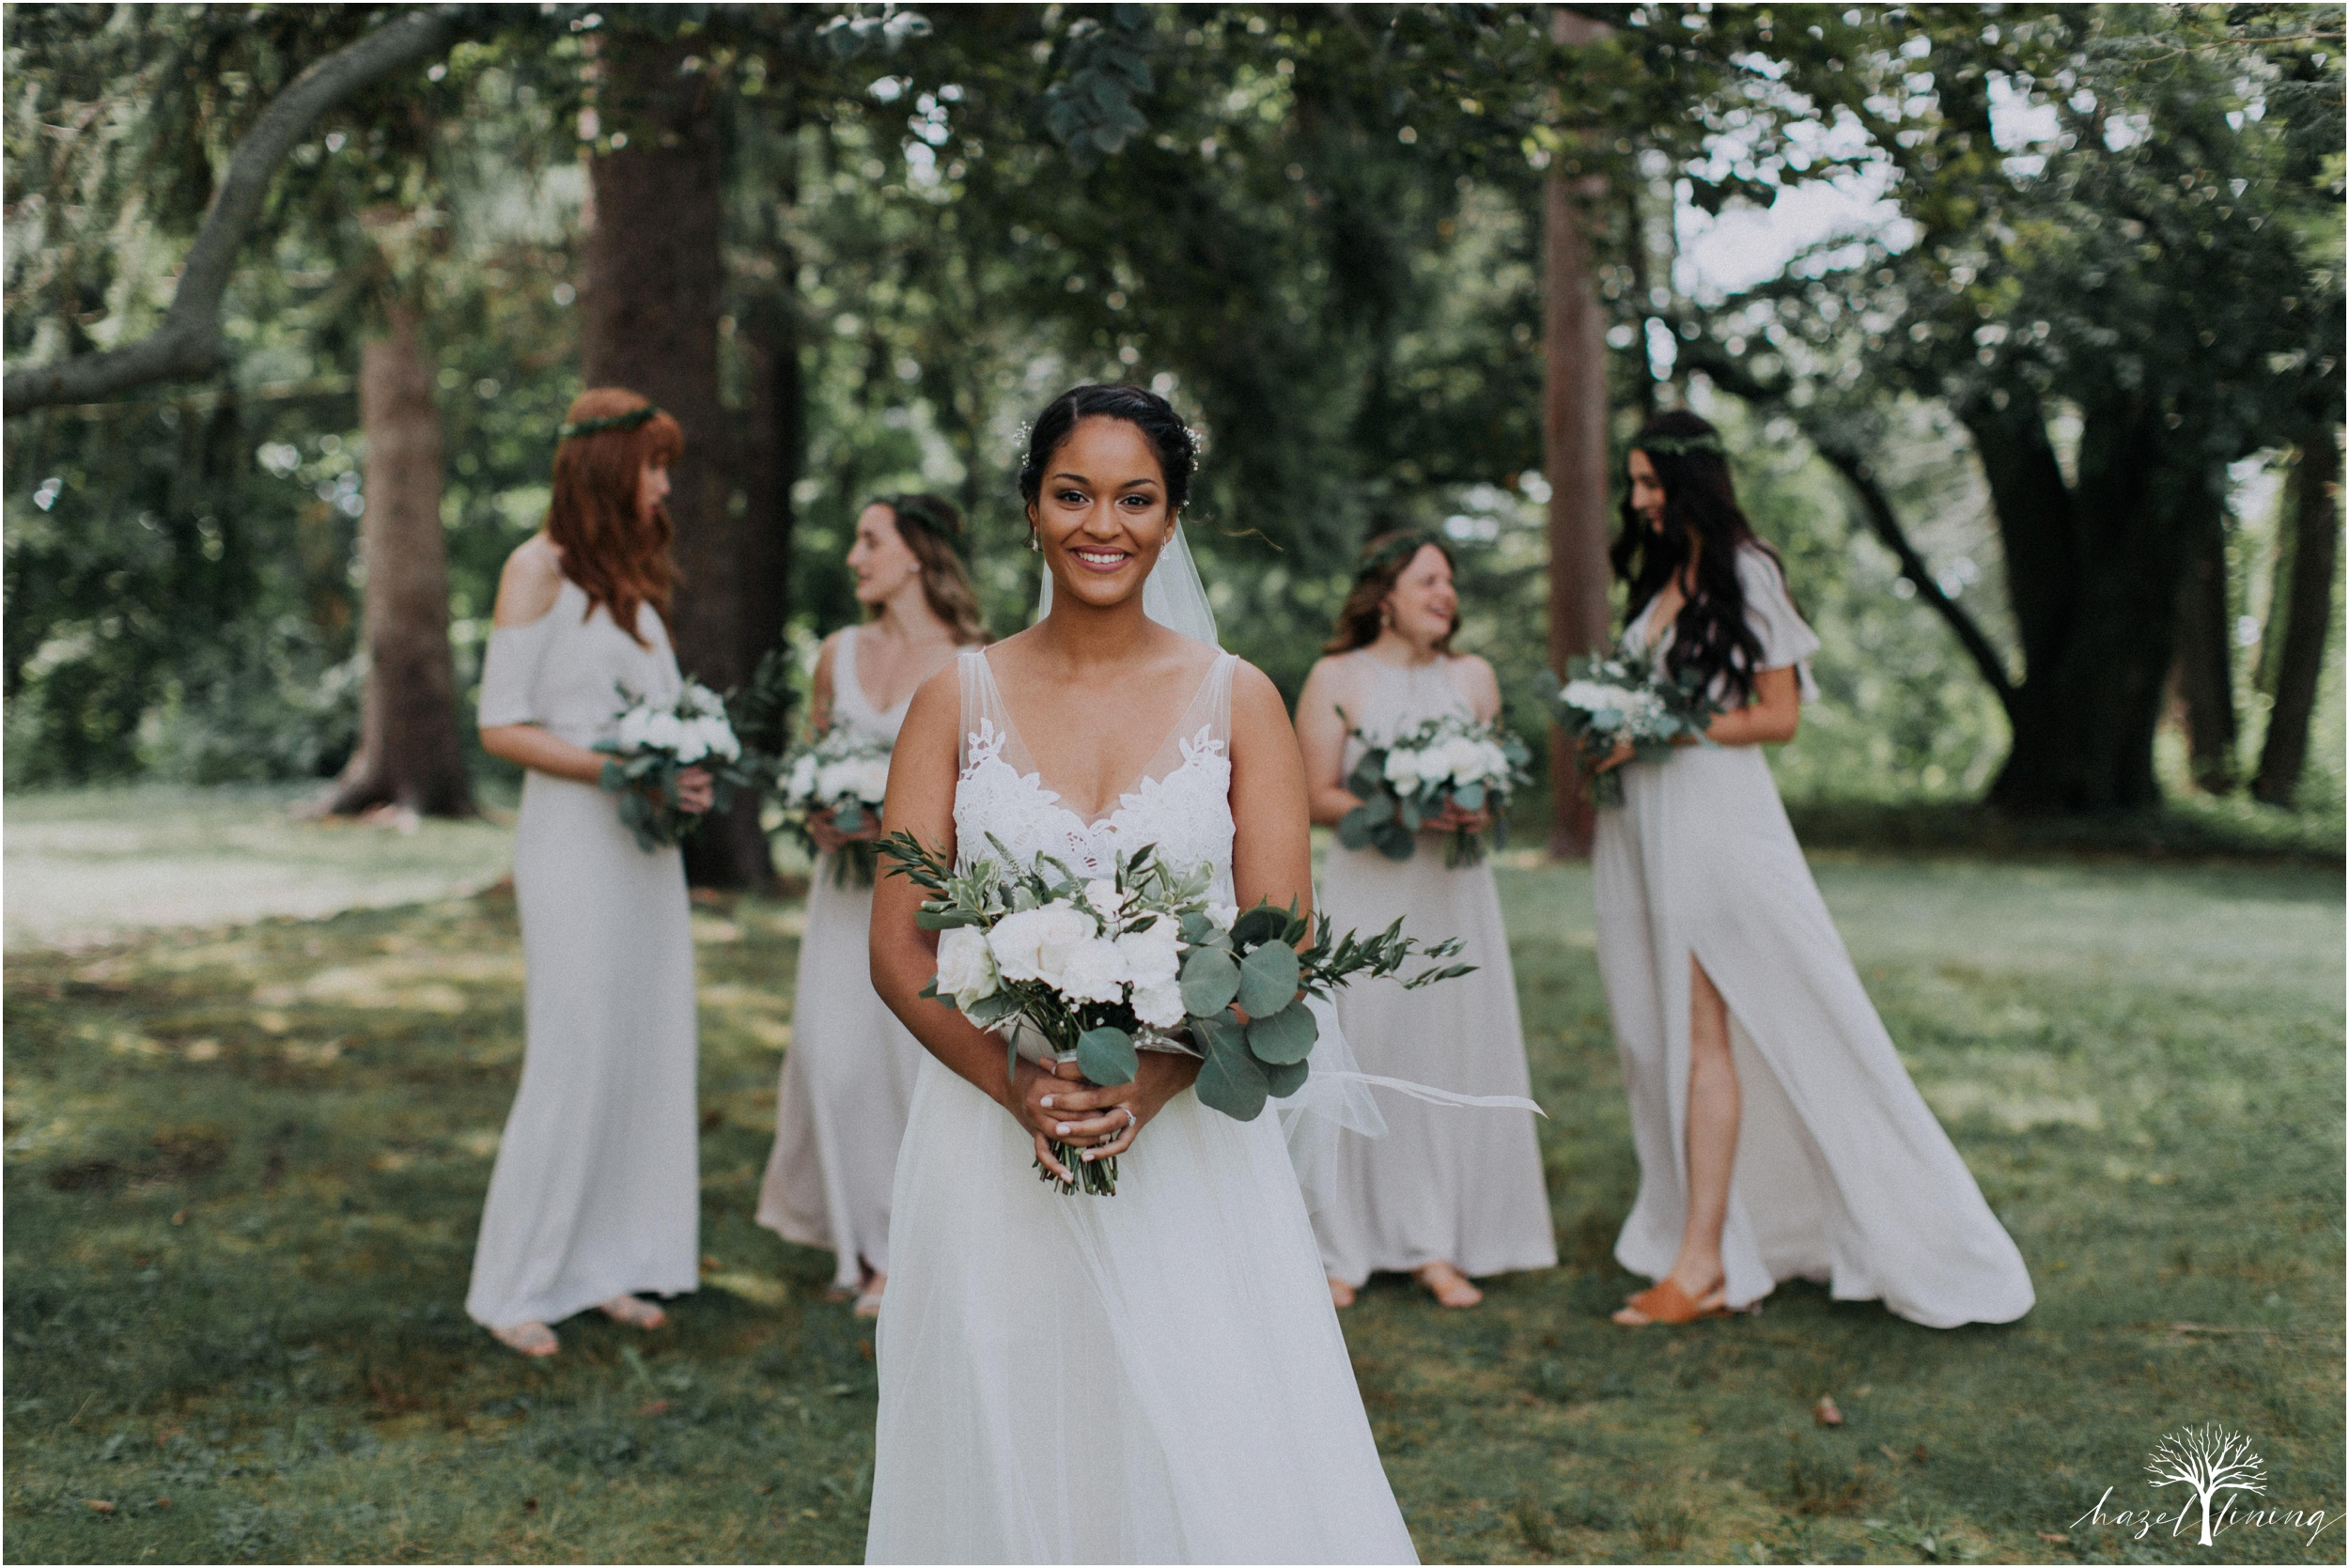 mariah-kreyling-samuel-sherratt-sherrattwiththeworld-peirce-farm-at-witch-hill-boston-massachusetts-wedding-photography-hazel-lining-travel-wedding-elopement-photography_0034.jpg